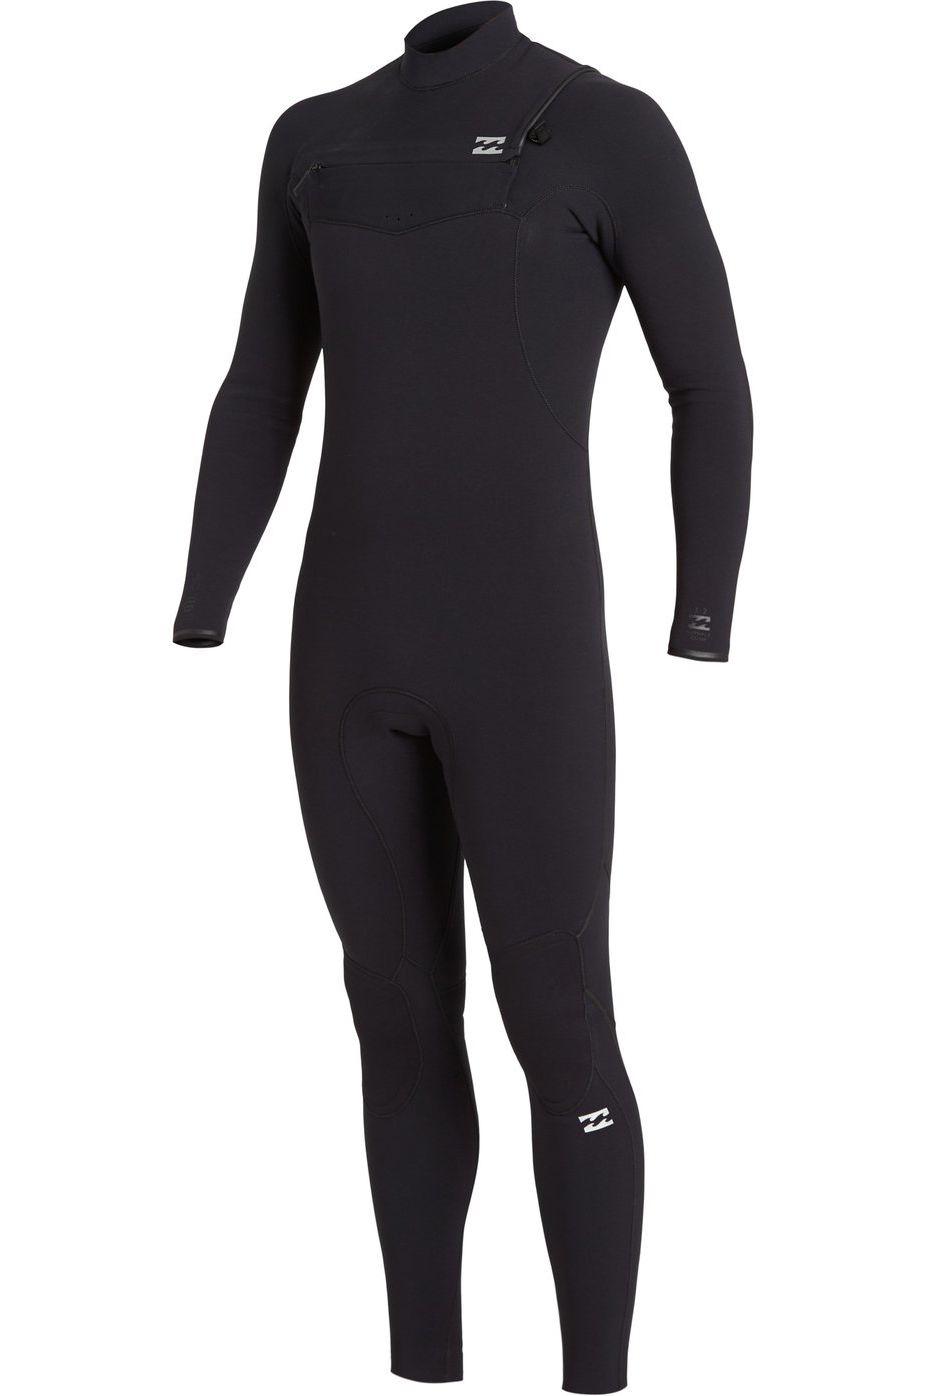 Billabong Wetsuit 403 FURN COMP CZ GBS Black 4x3mm